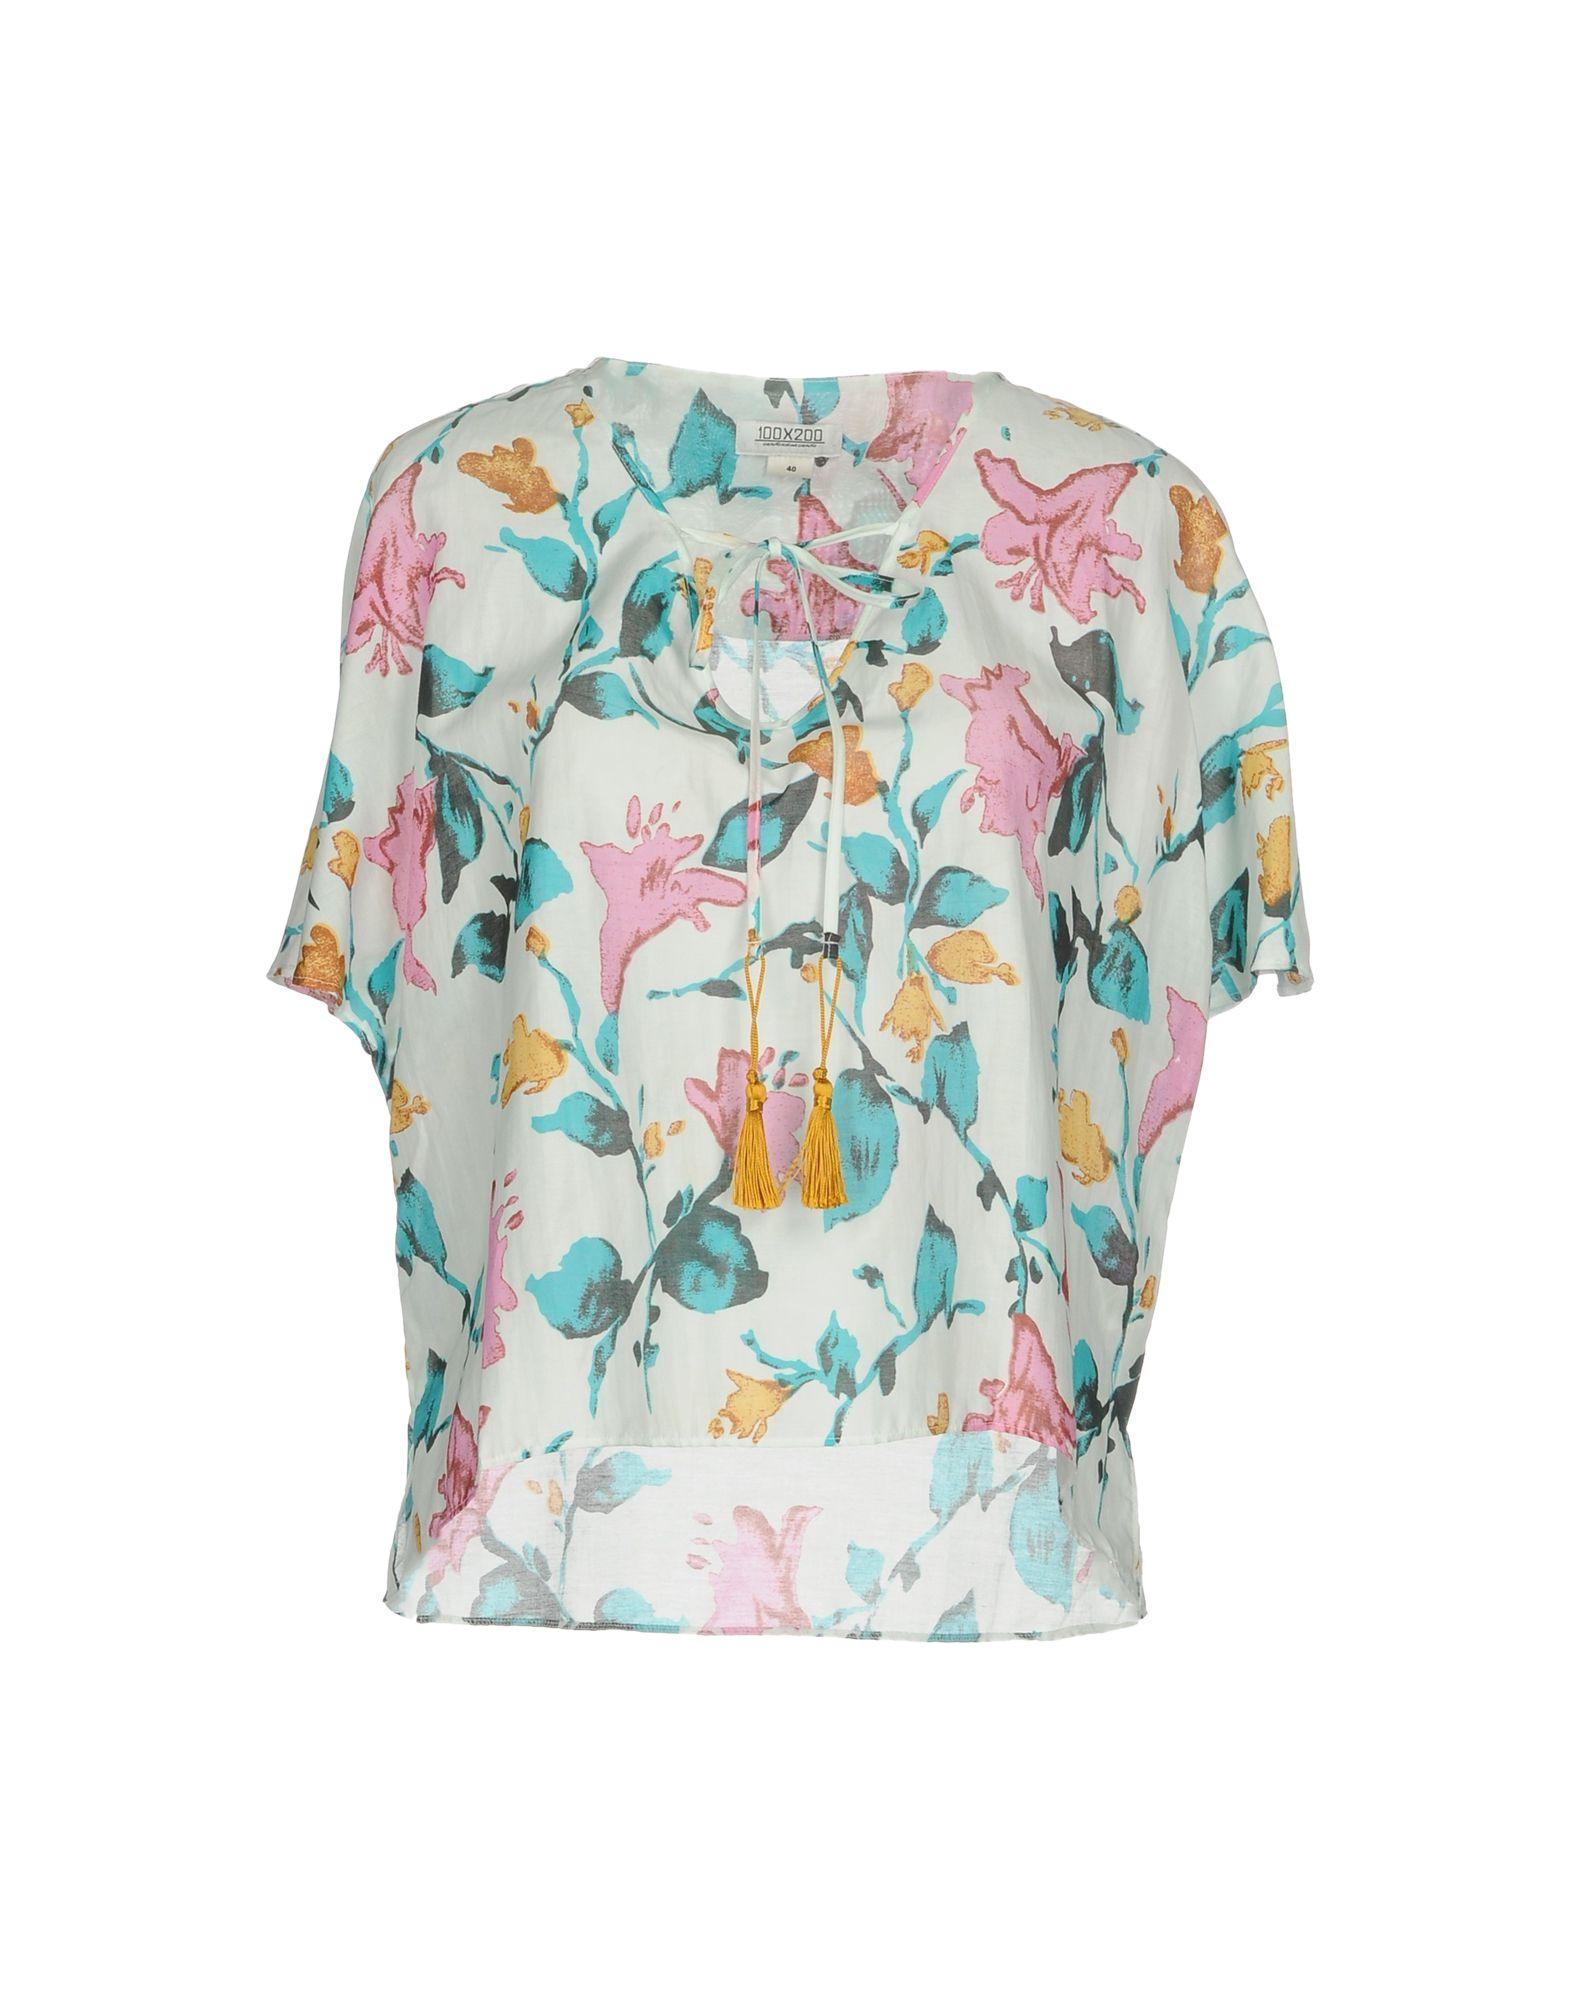 100X200 CENTOXDUECENTO Блузка 100x200 centoxduecento пляжное платье